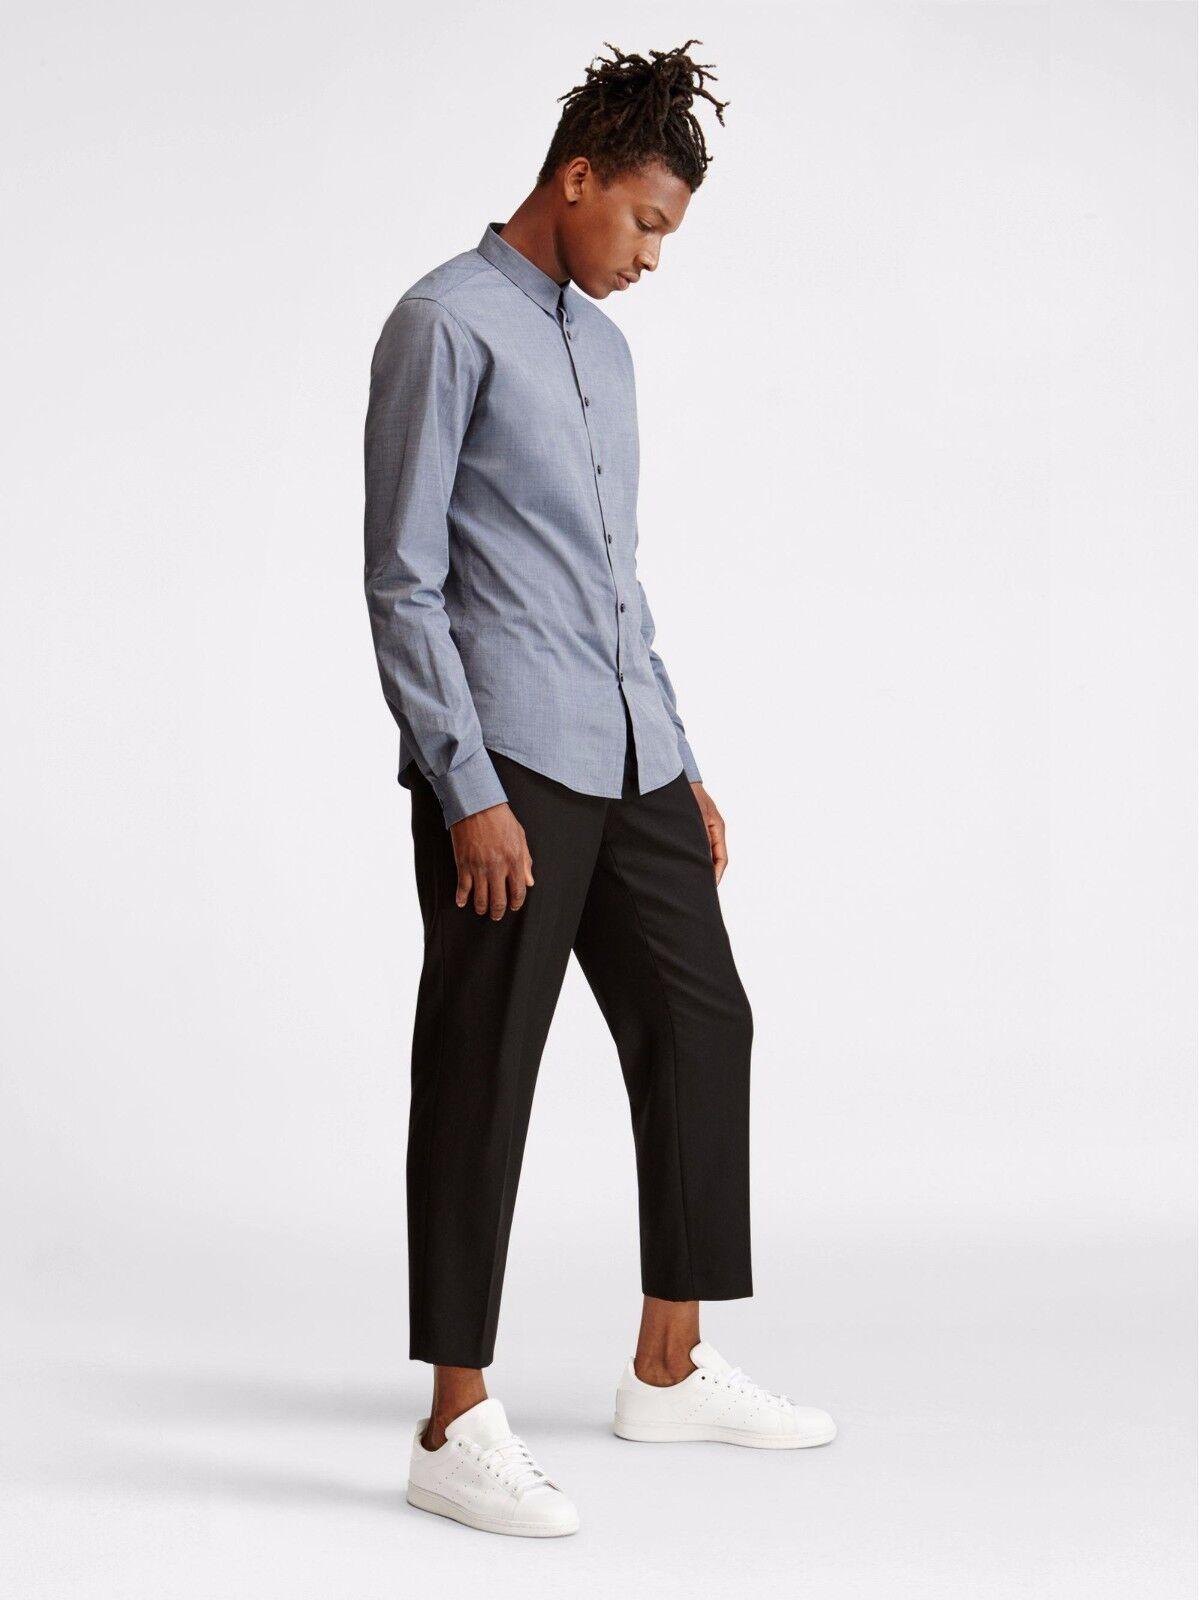 Herren DKNY True Blau CollaROT Shirt XL   CS074 03 O